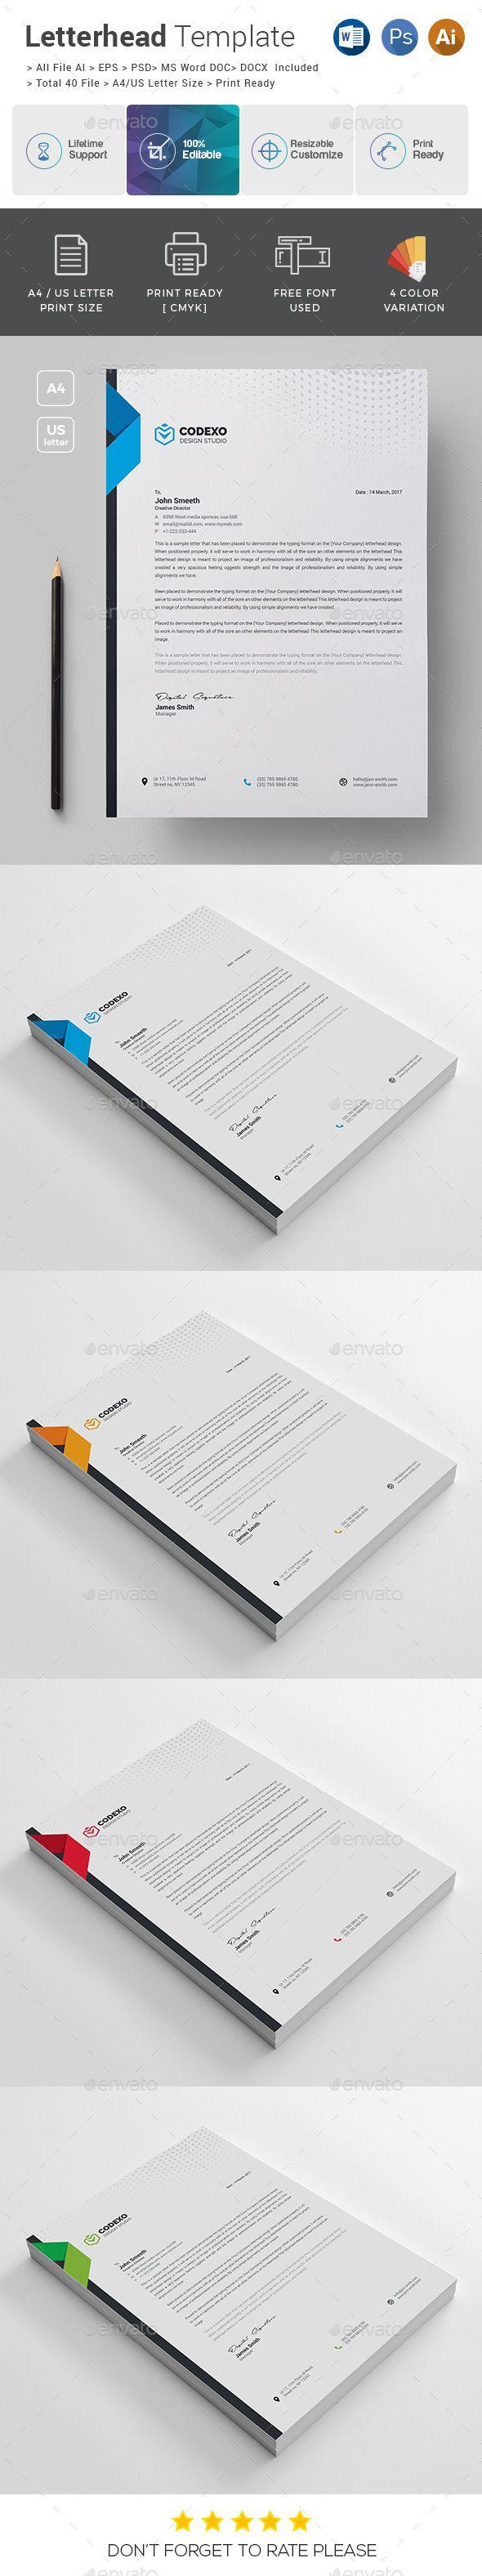 Corporate Letterhead Template PSD, Vector EPS, AI